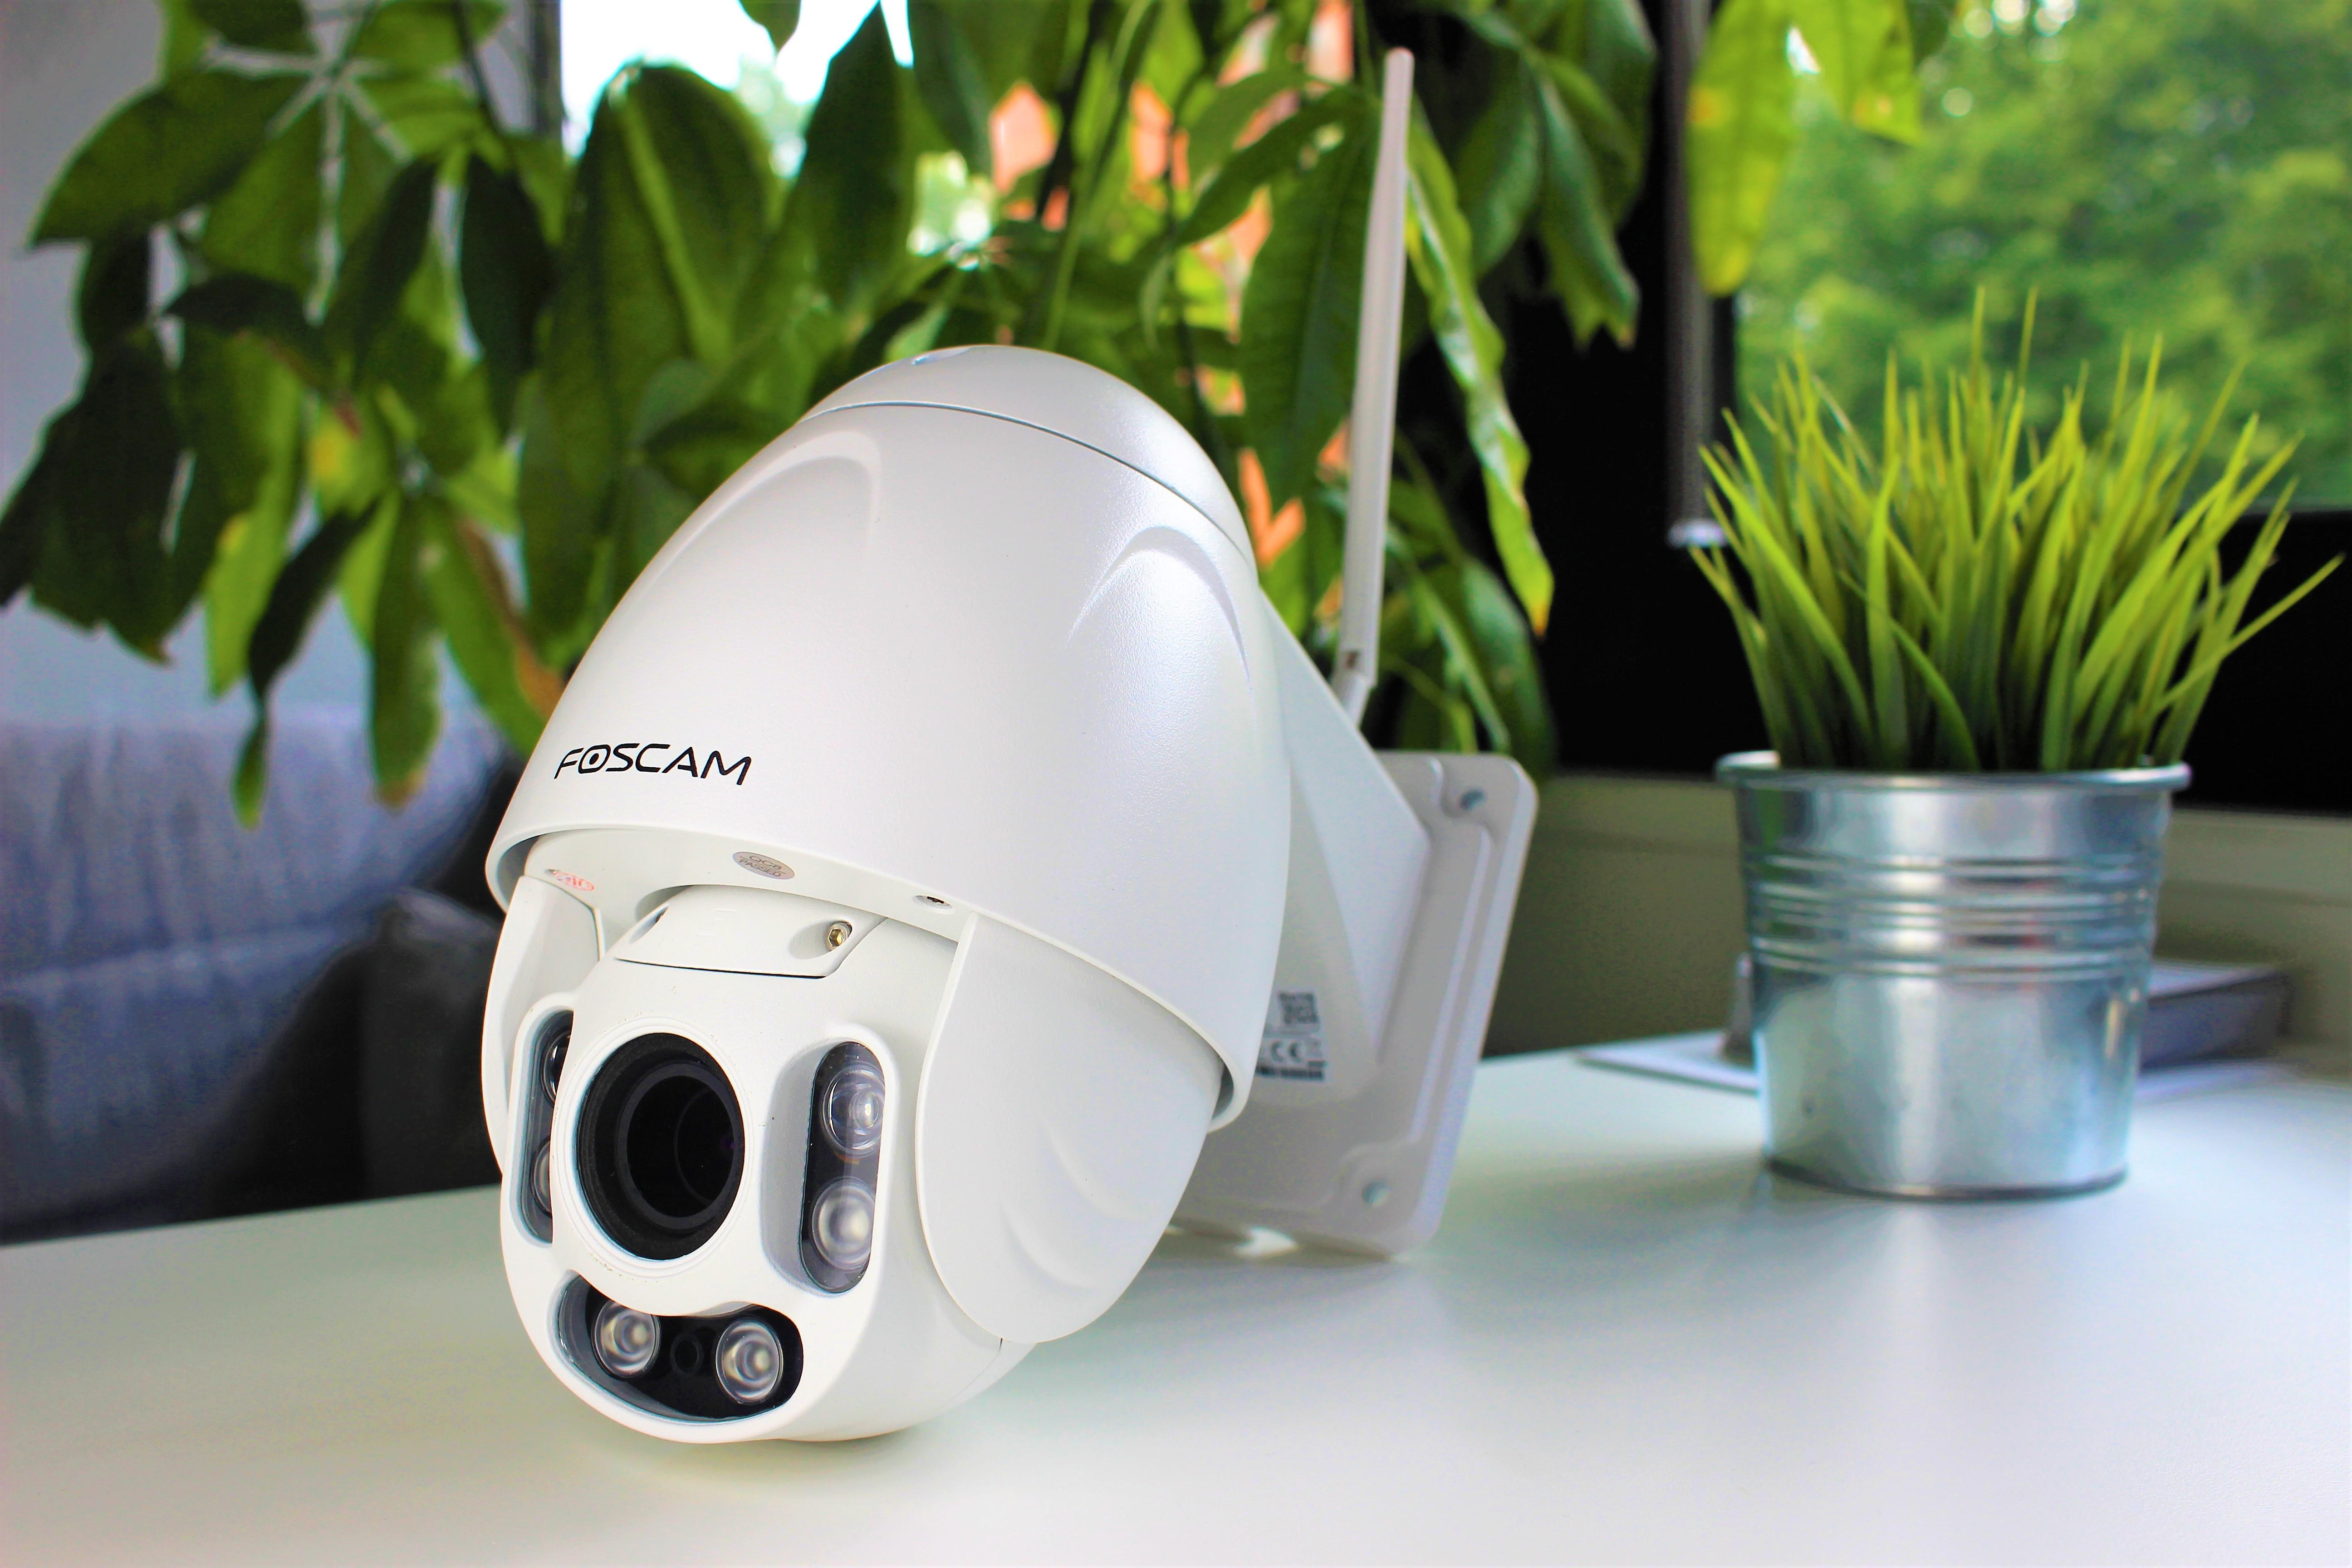 foscam fi9928p berwachungskamera im test. Black Bedroom Furniture Sets. Home Design Ideas